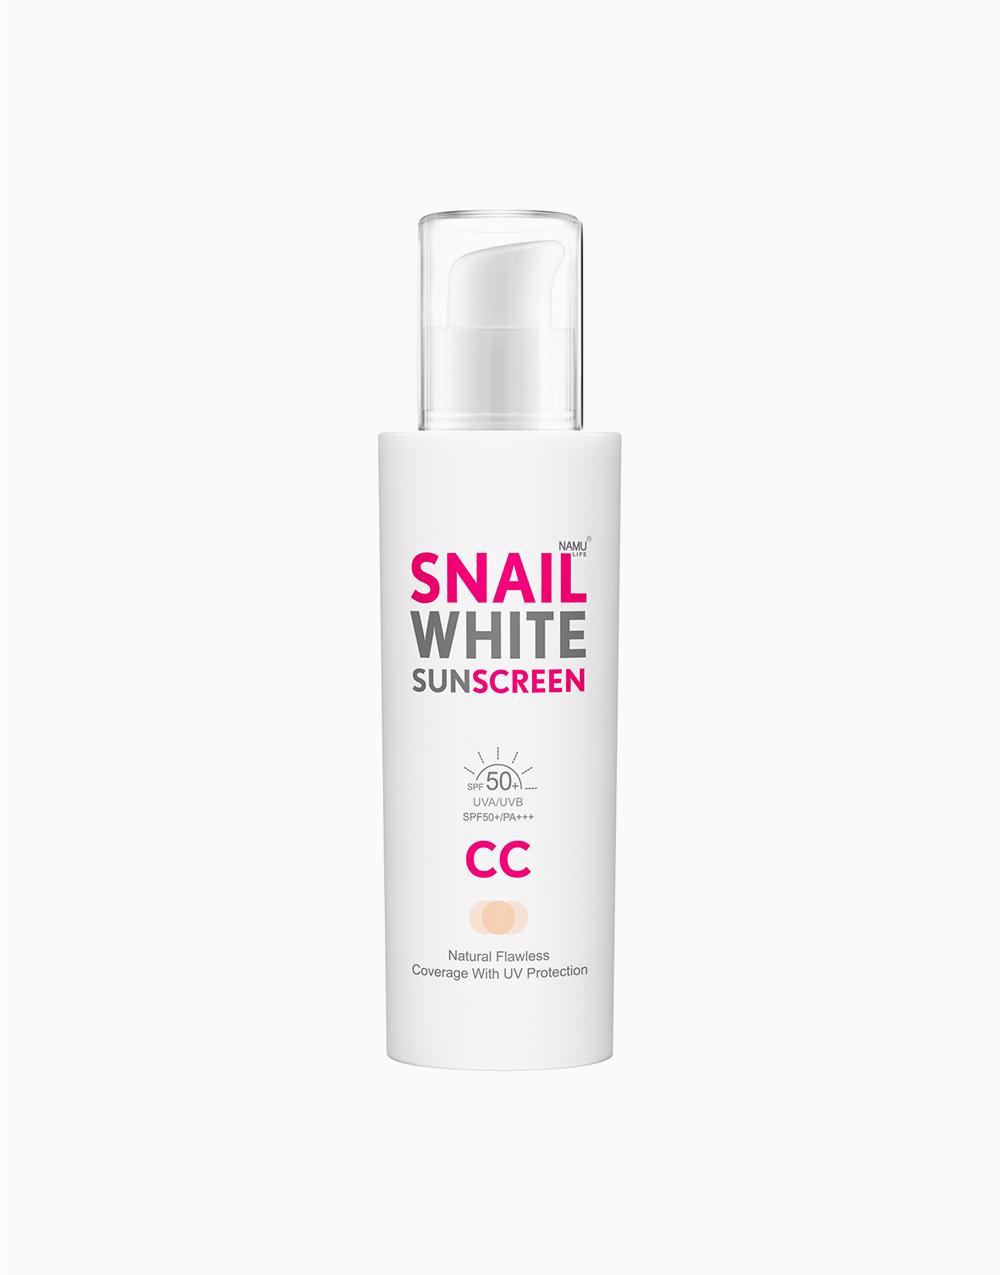 CC Cream SPF 50 by SNAILWHITE